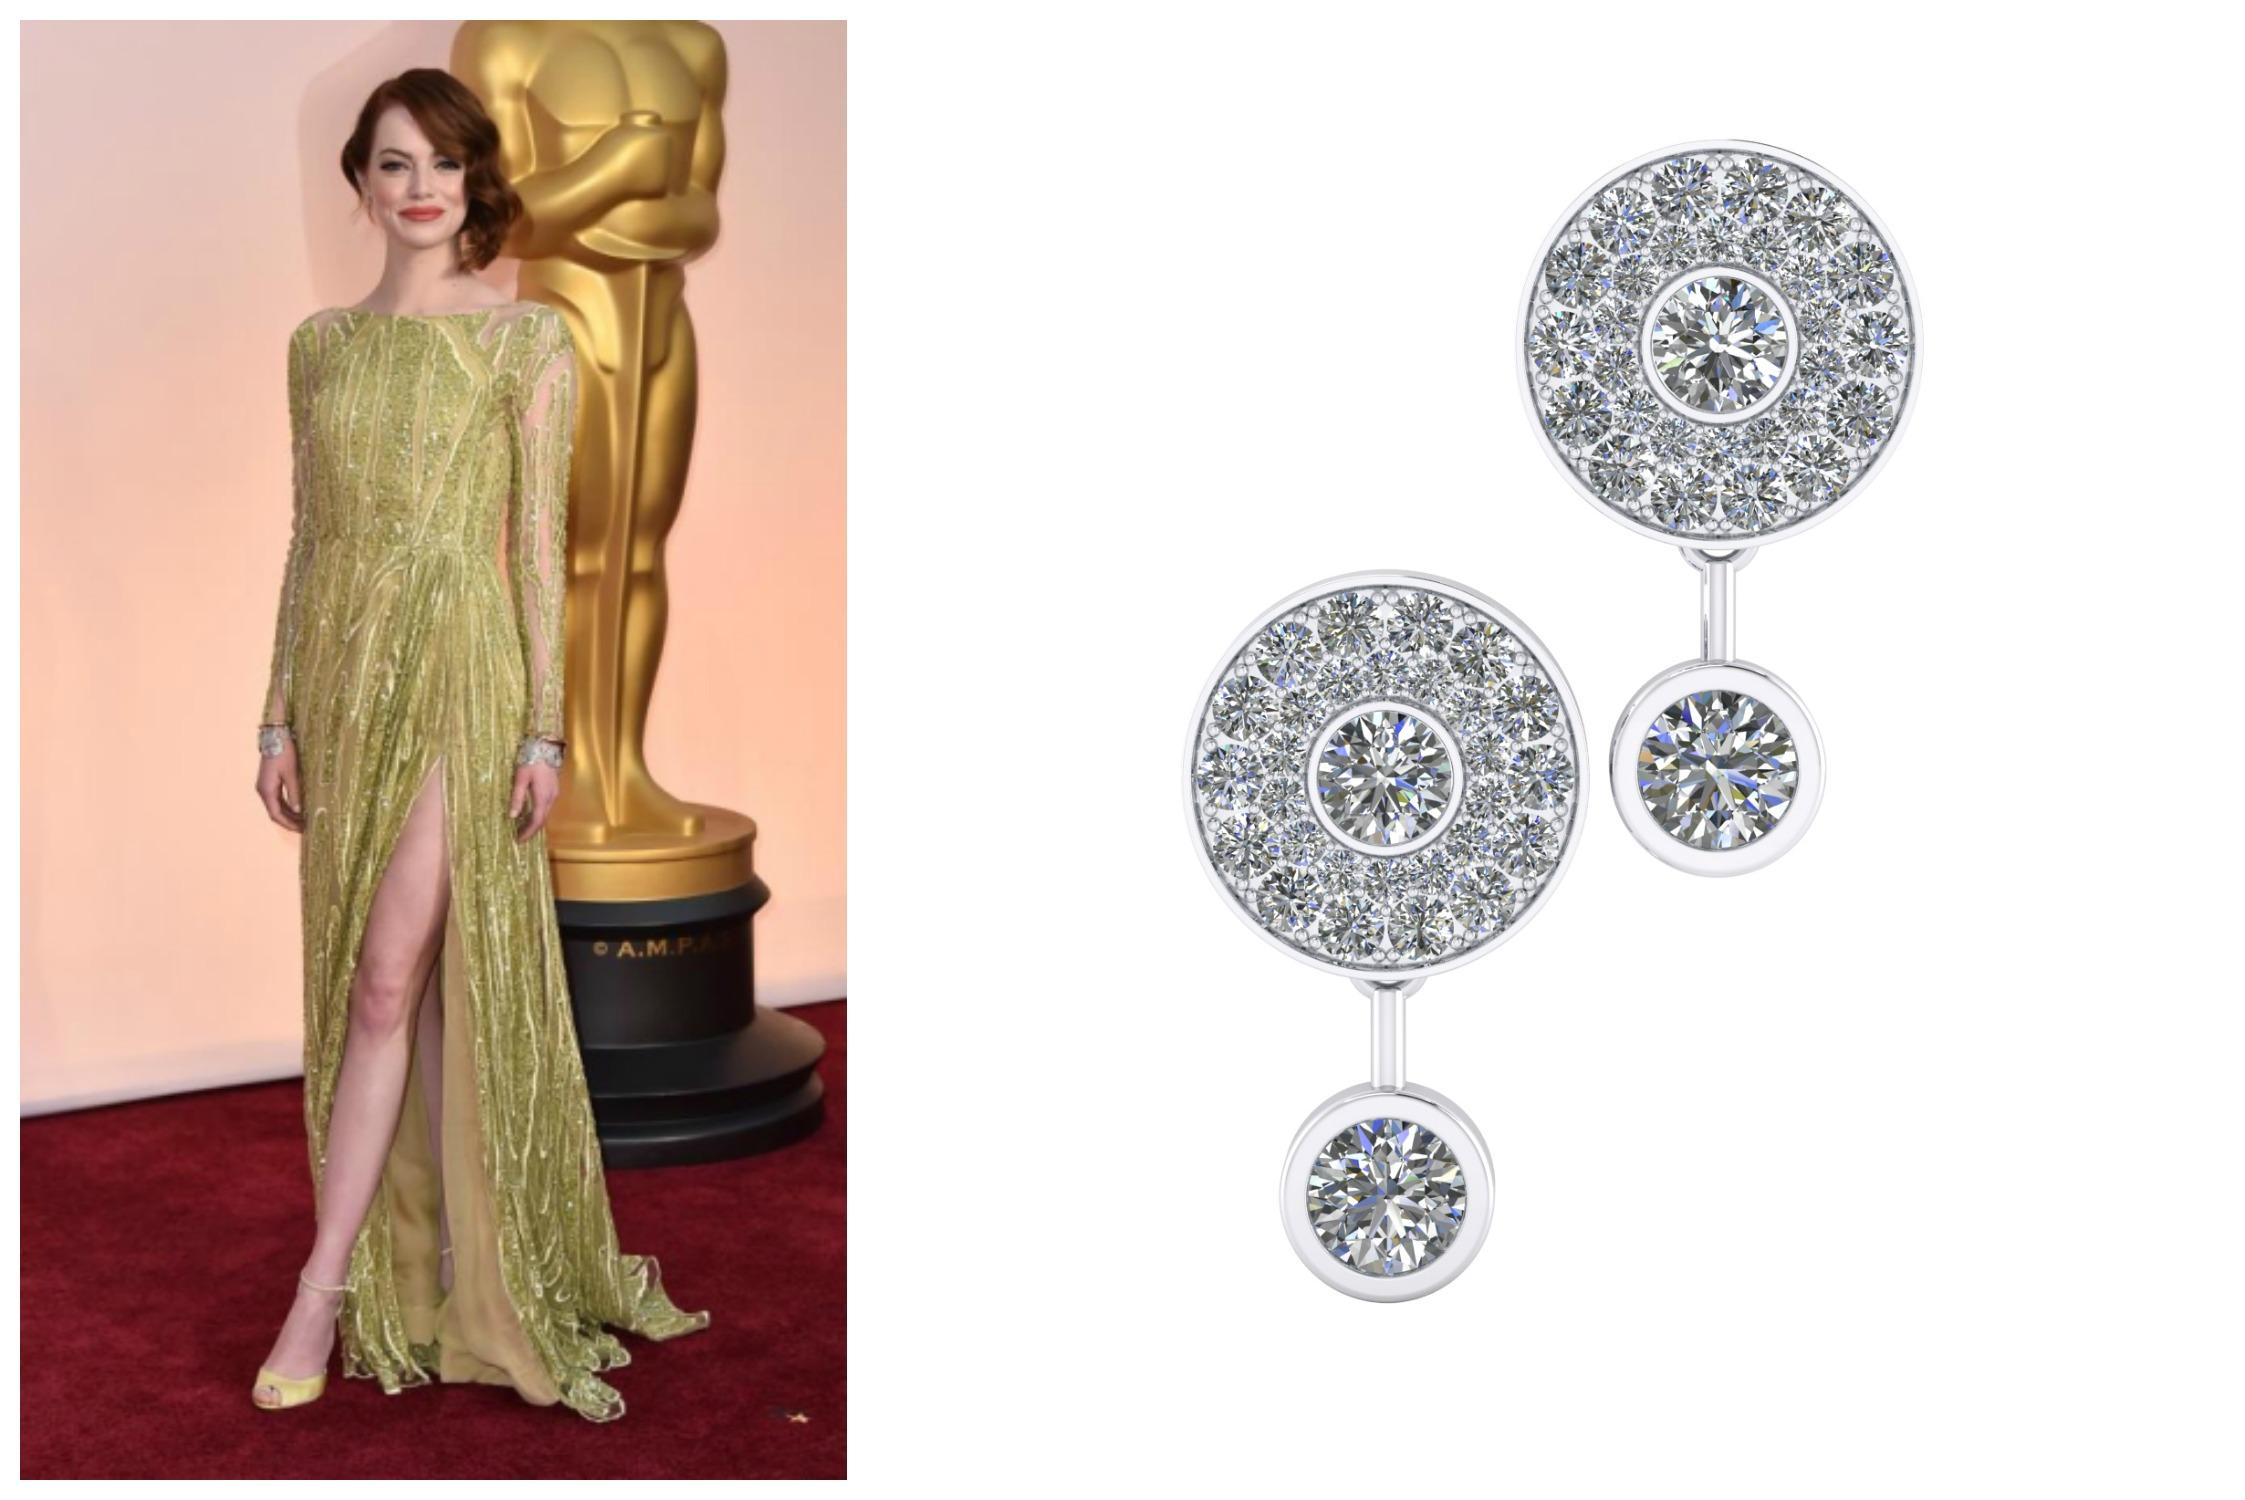 Emma Stone CP - Beautiful earrings in 18k white gold and 68 diamonds Clemency Peris